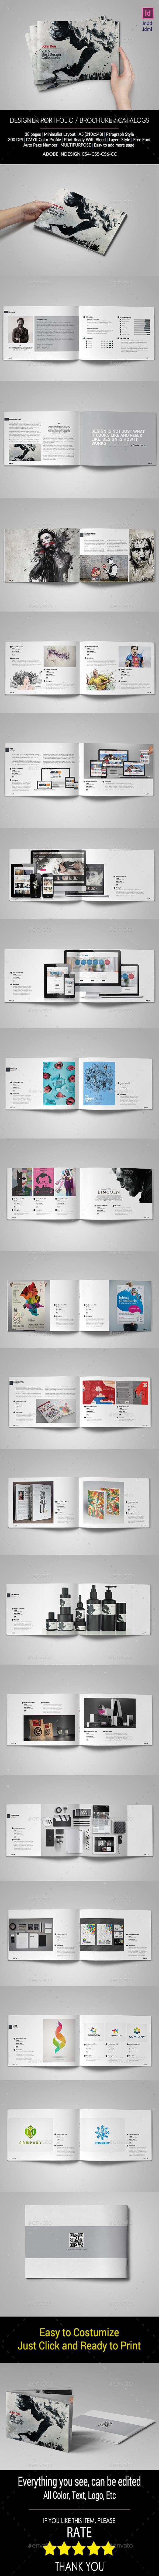 A5 Graphic Designer Portfolio - Portfolio Brochures